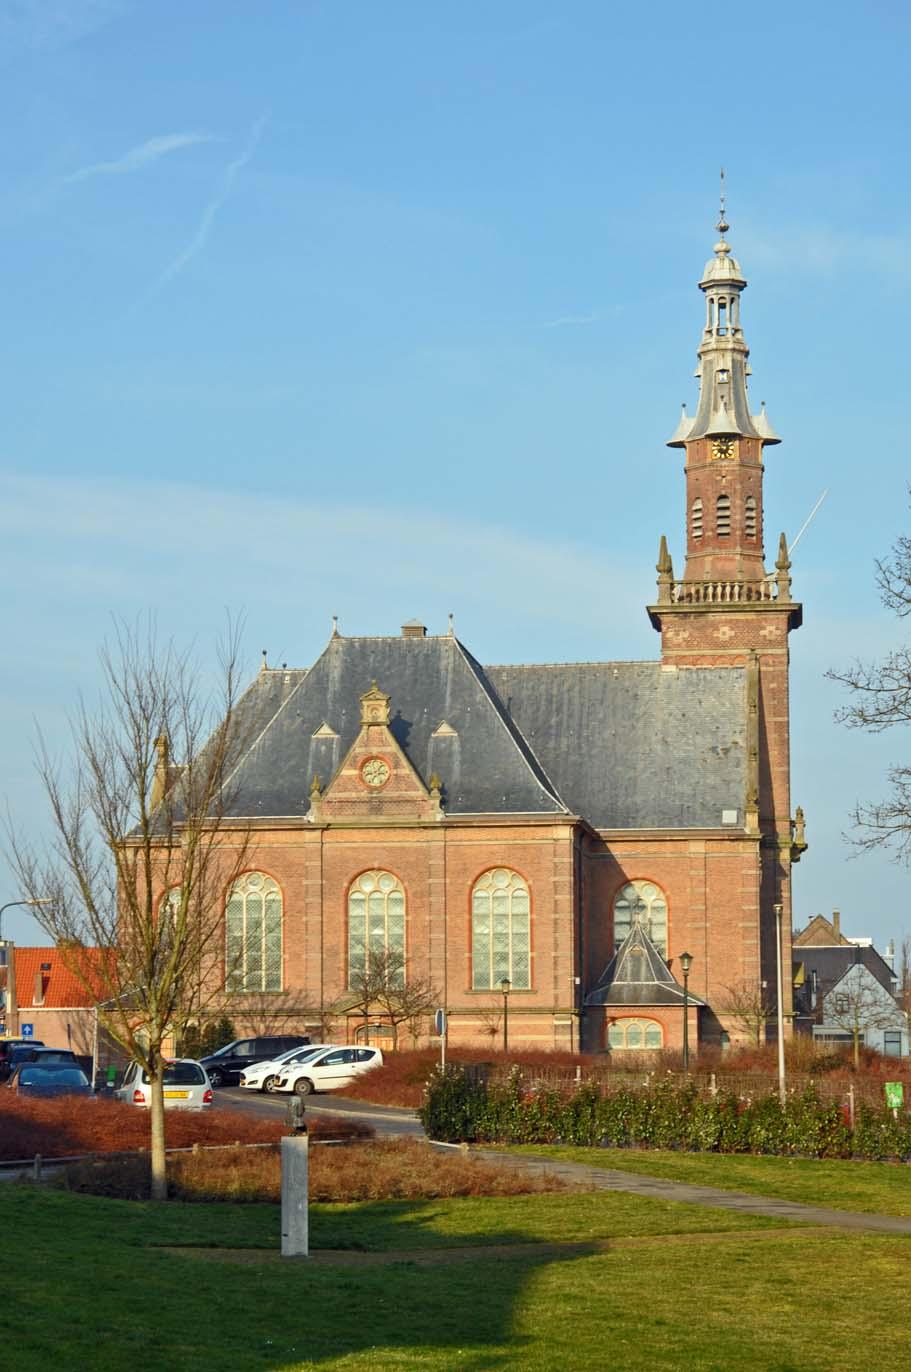 nl dating sites Katwijk